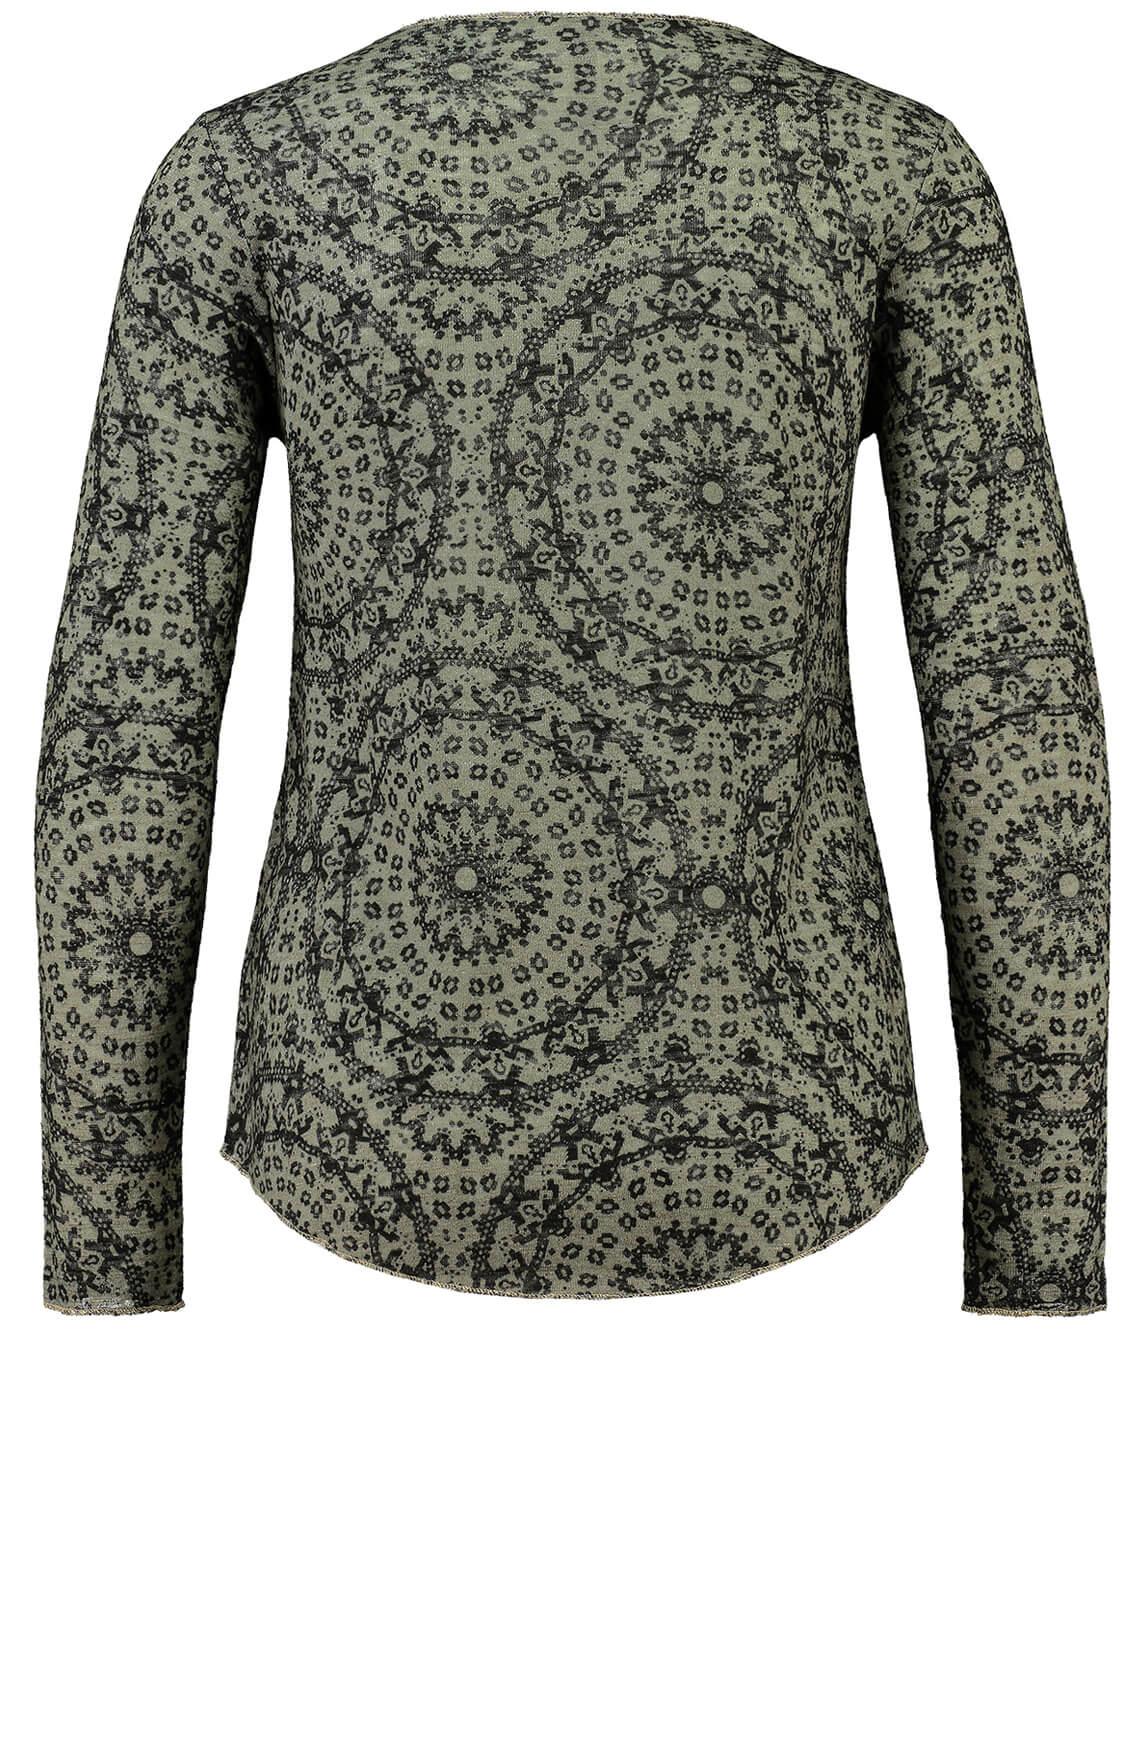 Key Largo Dames Illusion shirt groen